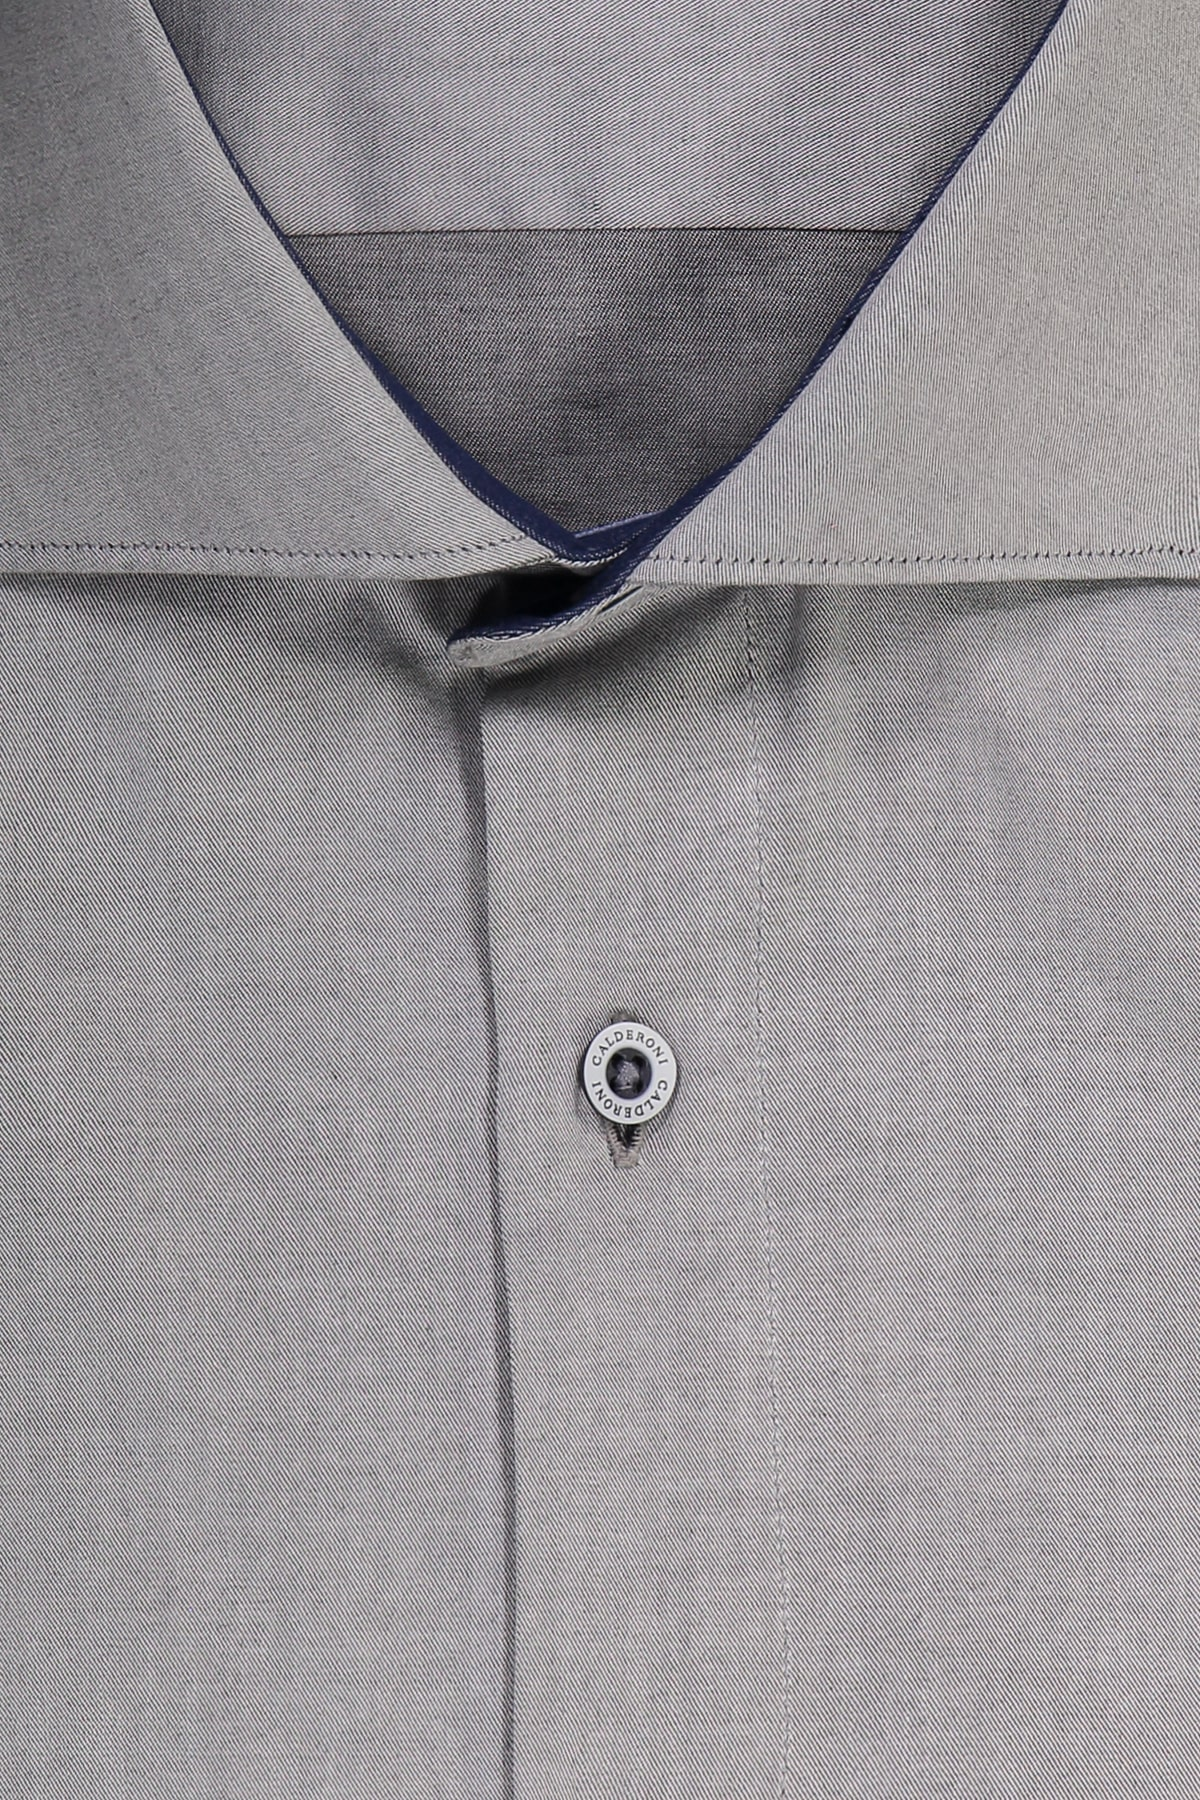 Camisa Sport CALDERONI Gris Claro 100% algodón corte Slim.